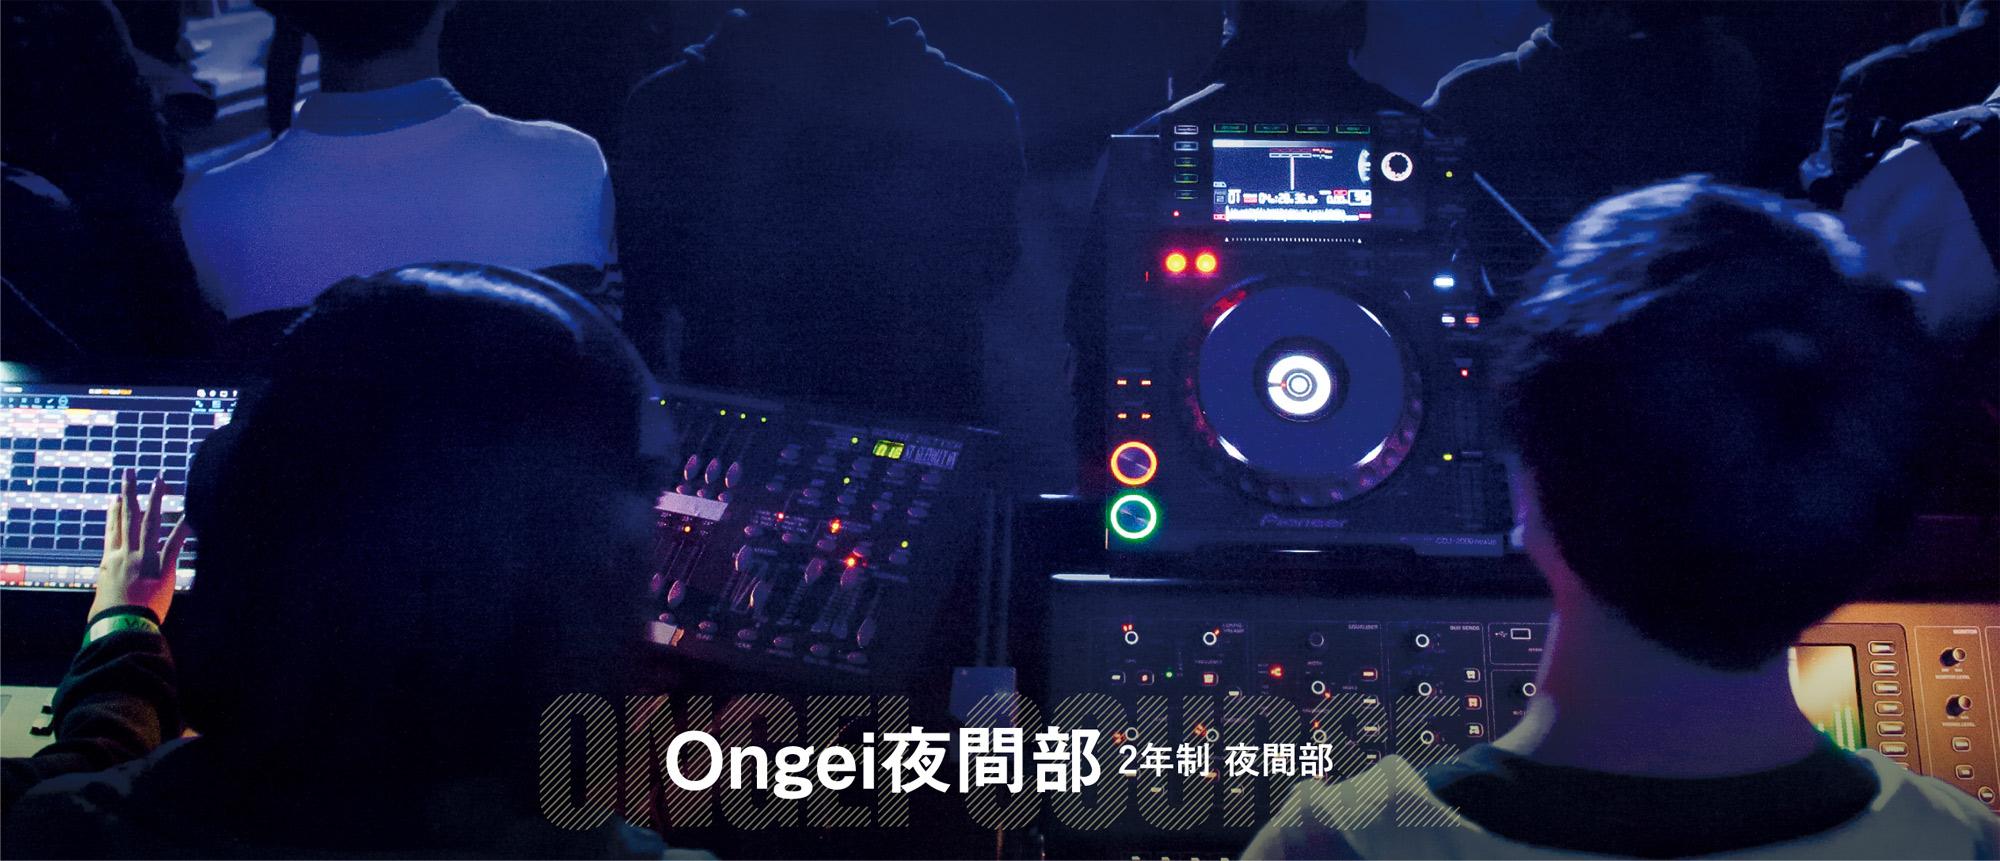 Ongei夜間部 2年制 夜間部